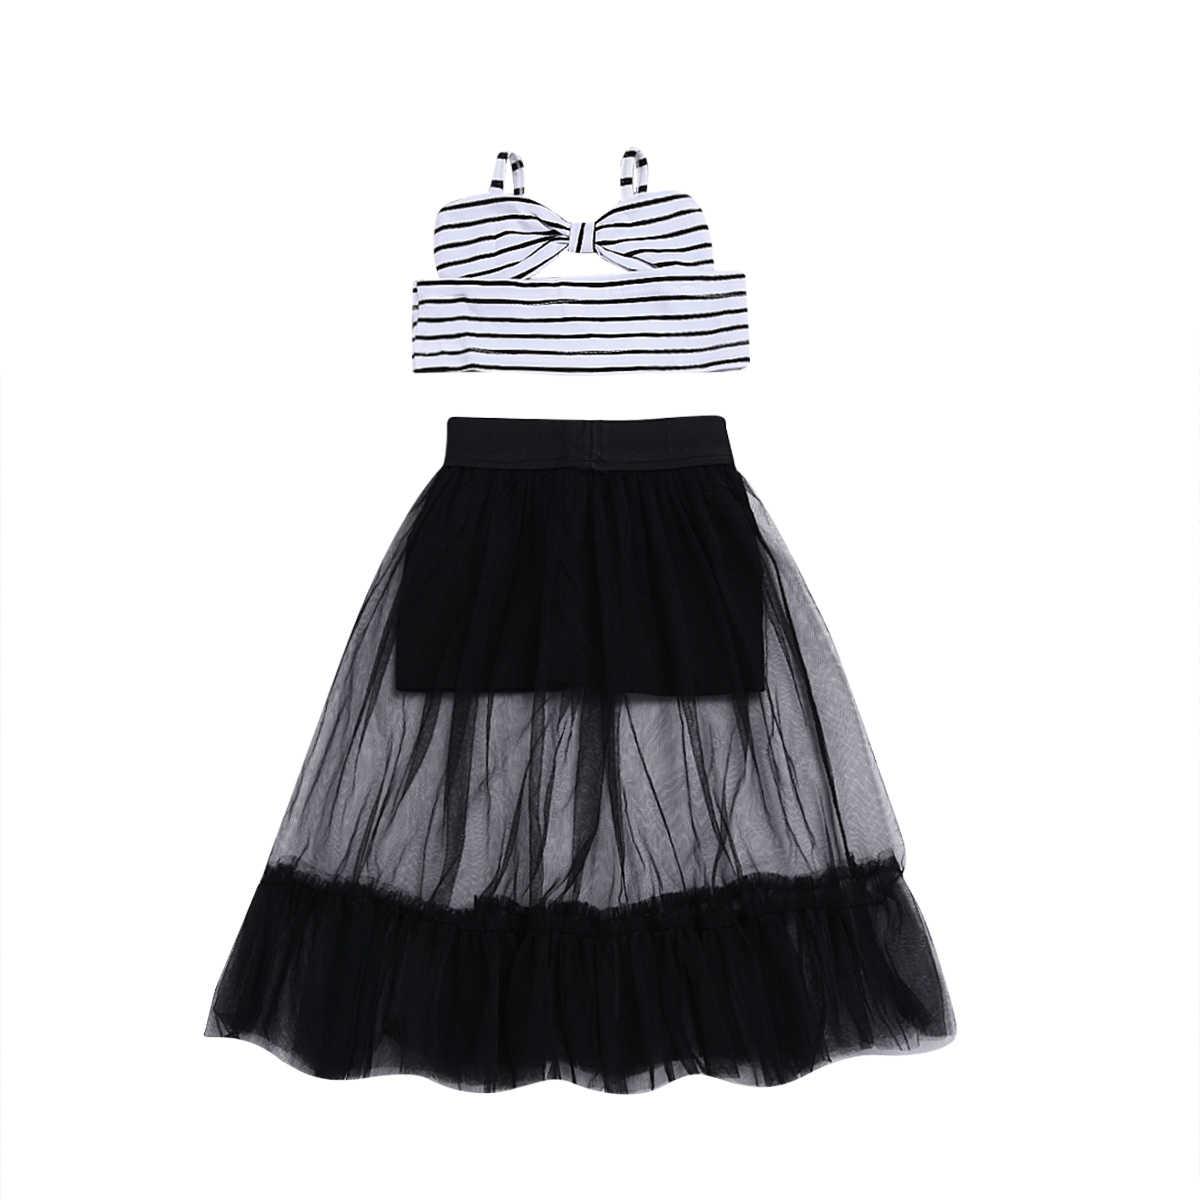 3147b4bbc184 2Pcs Toddler Baby Kids Girls Dress Summer Sleeveless Striped Crop Tops  Ruffles Tulle Skirt Casual Child